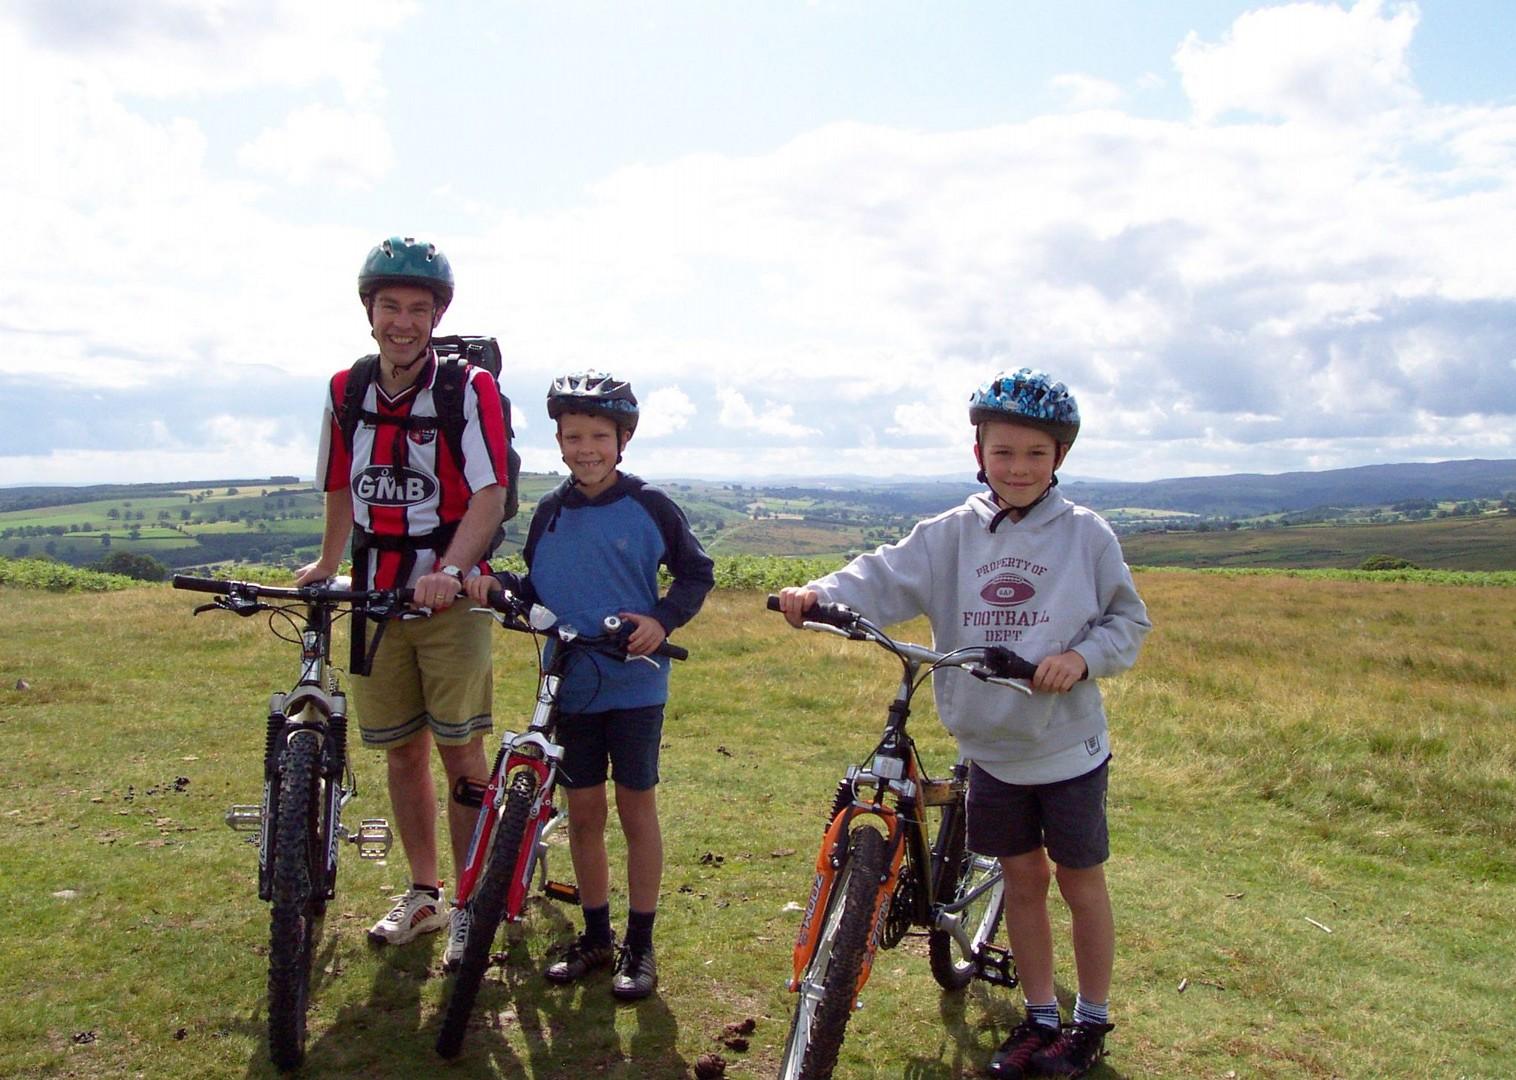 bike-skills-lake-district-guided-holiday.jpg - UK - Lake District - Guided Family Bike Skills - Family Cycling